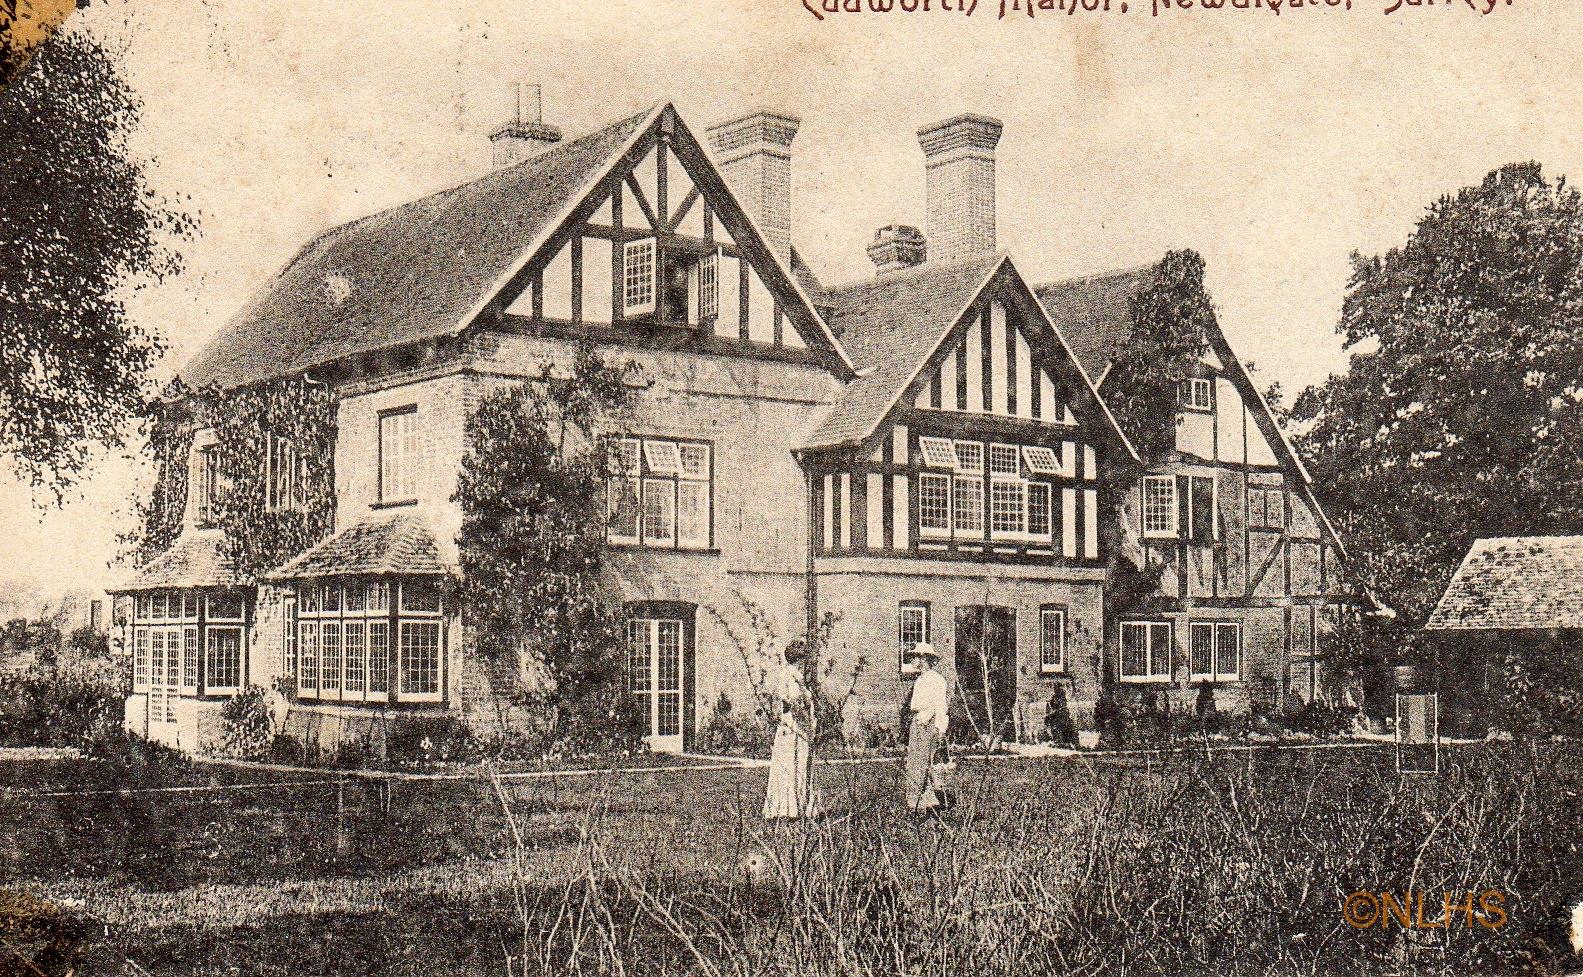 Cudworth Manor - 1 -Postmark 1904